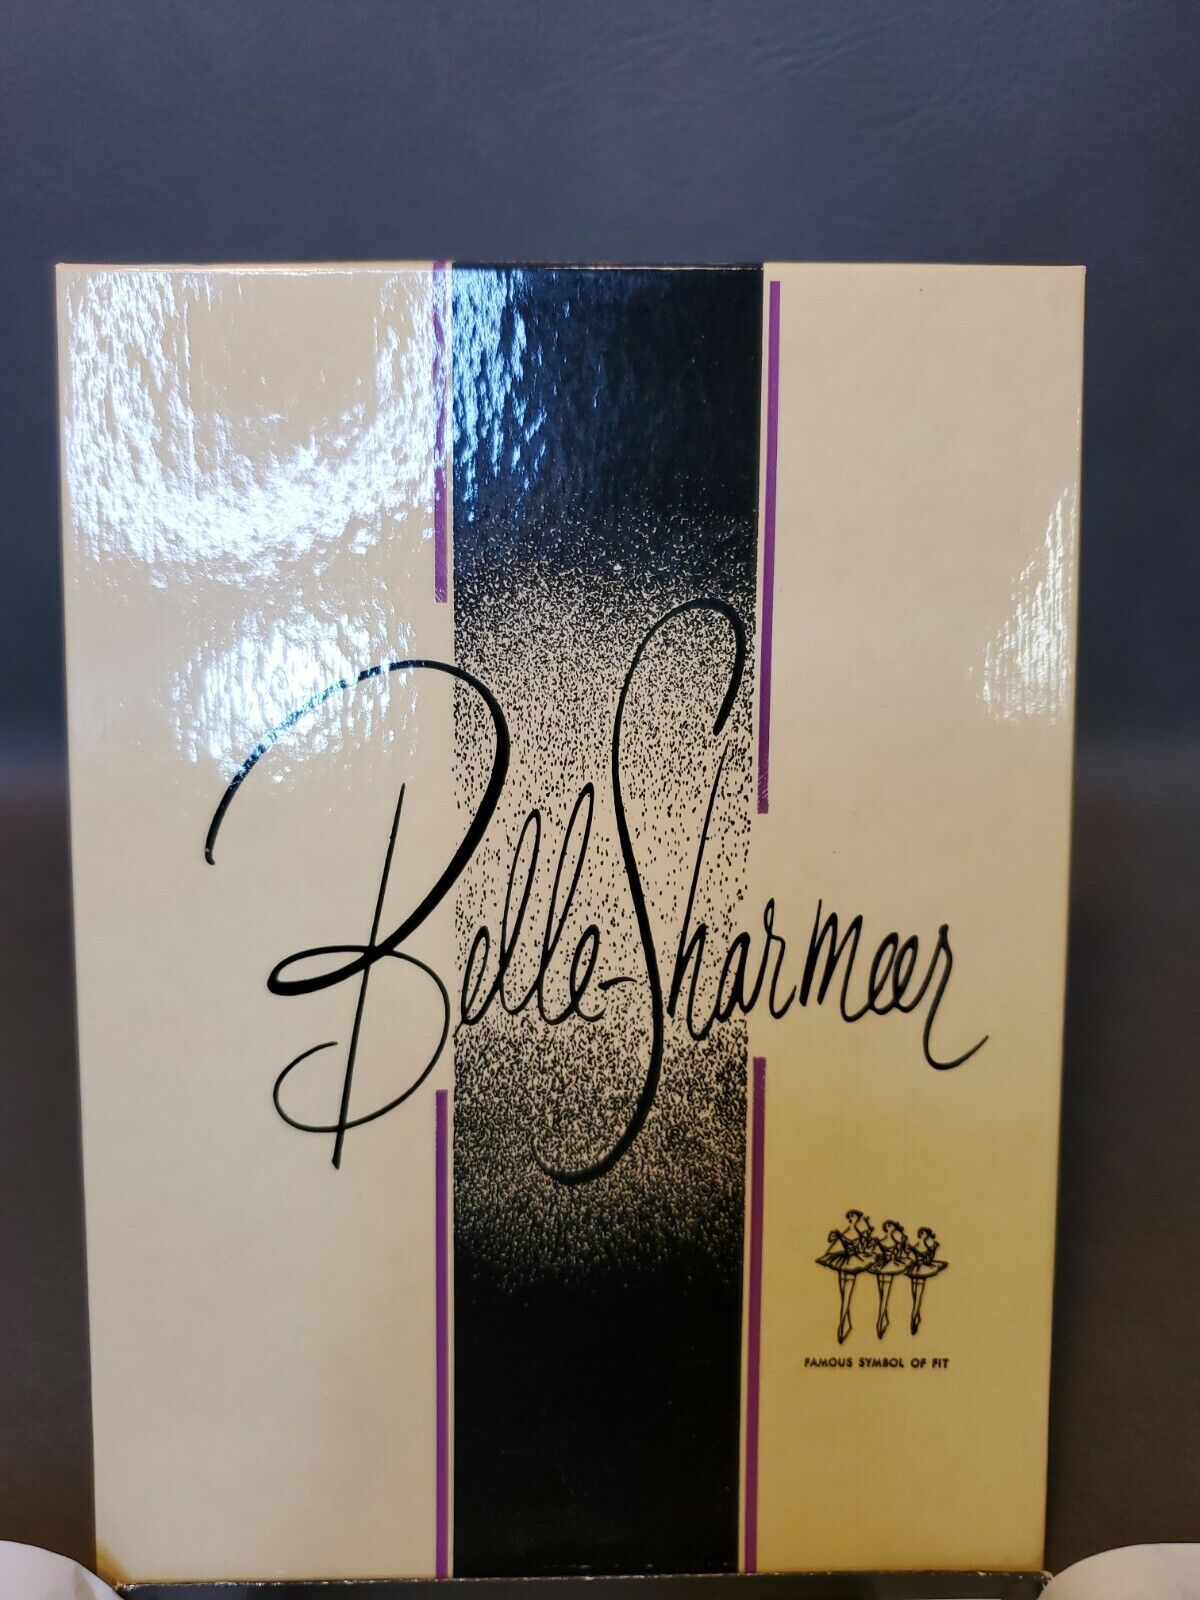 1 pair Vintage Belle-Sharmeer Stockings Froste Taupe 10S Seamless 700 Orig box